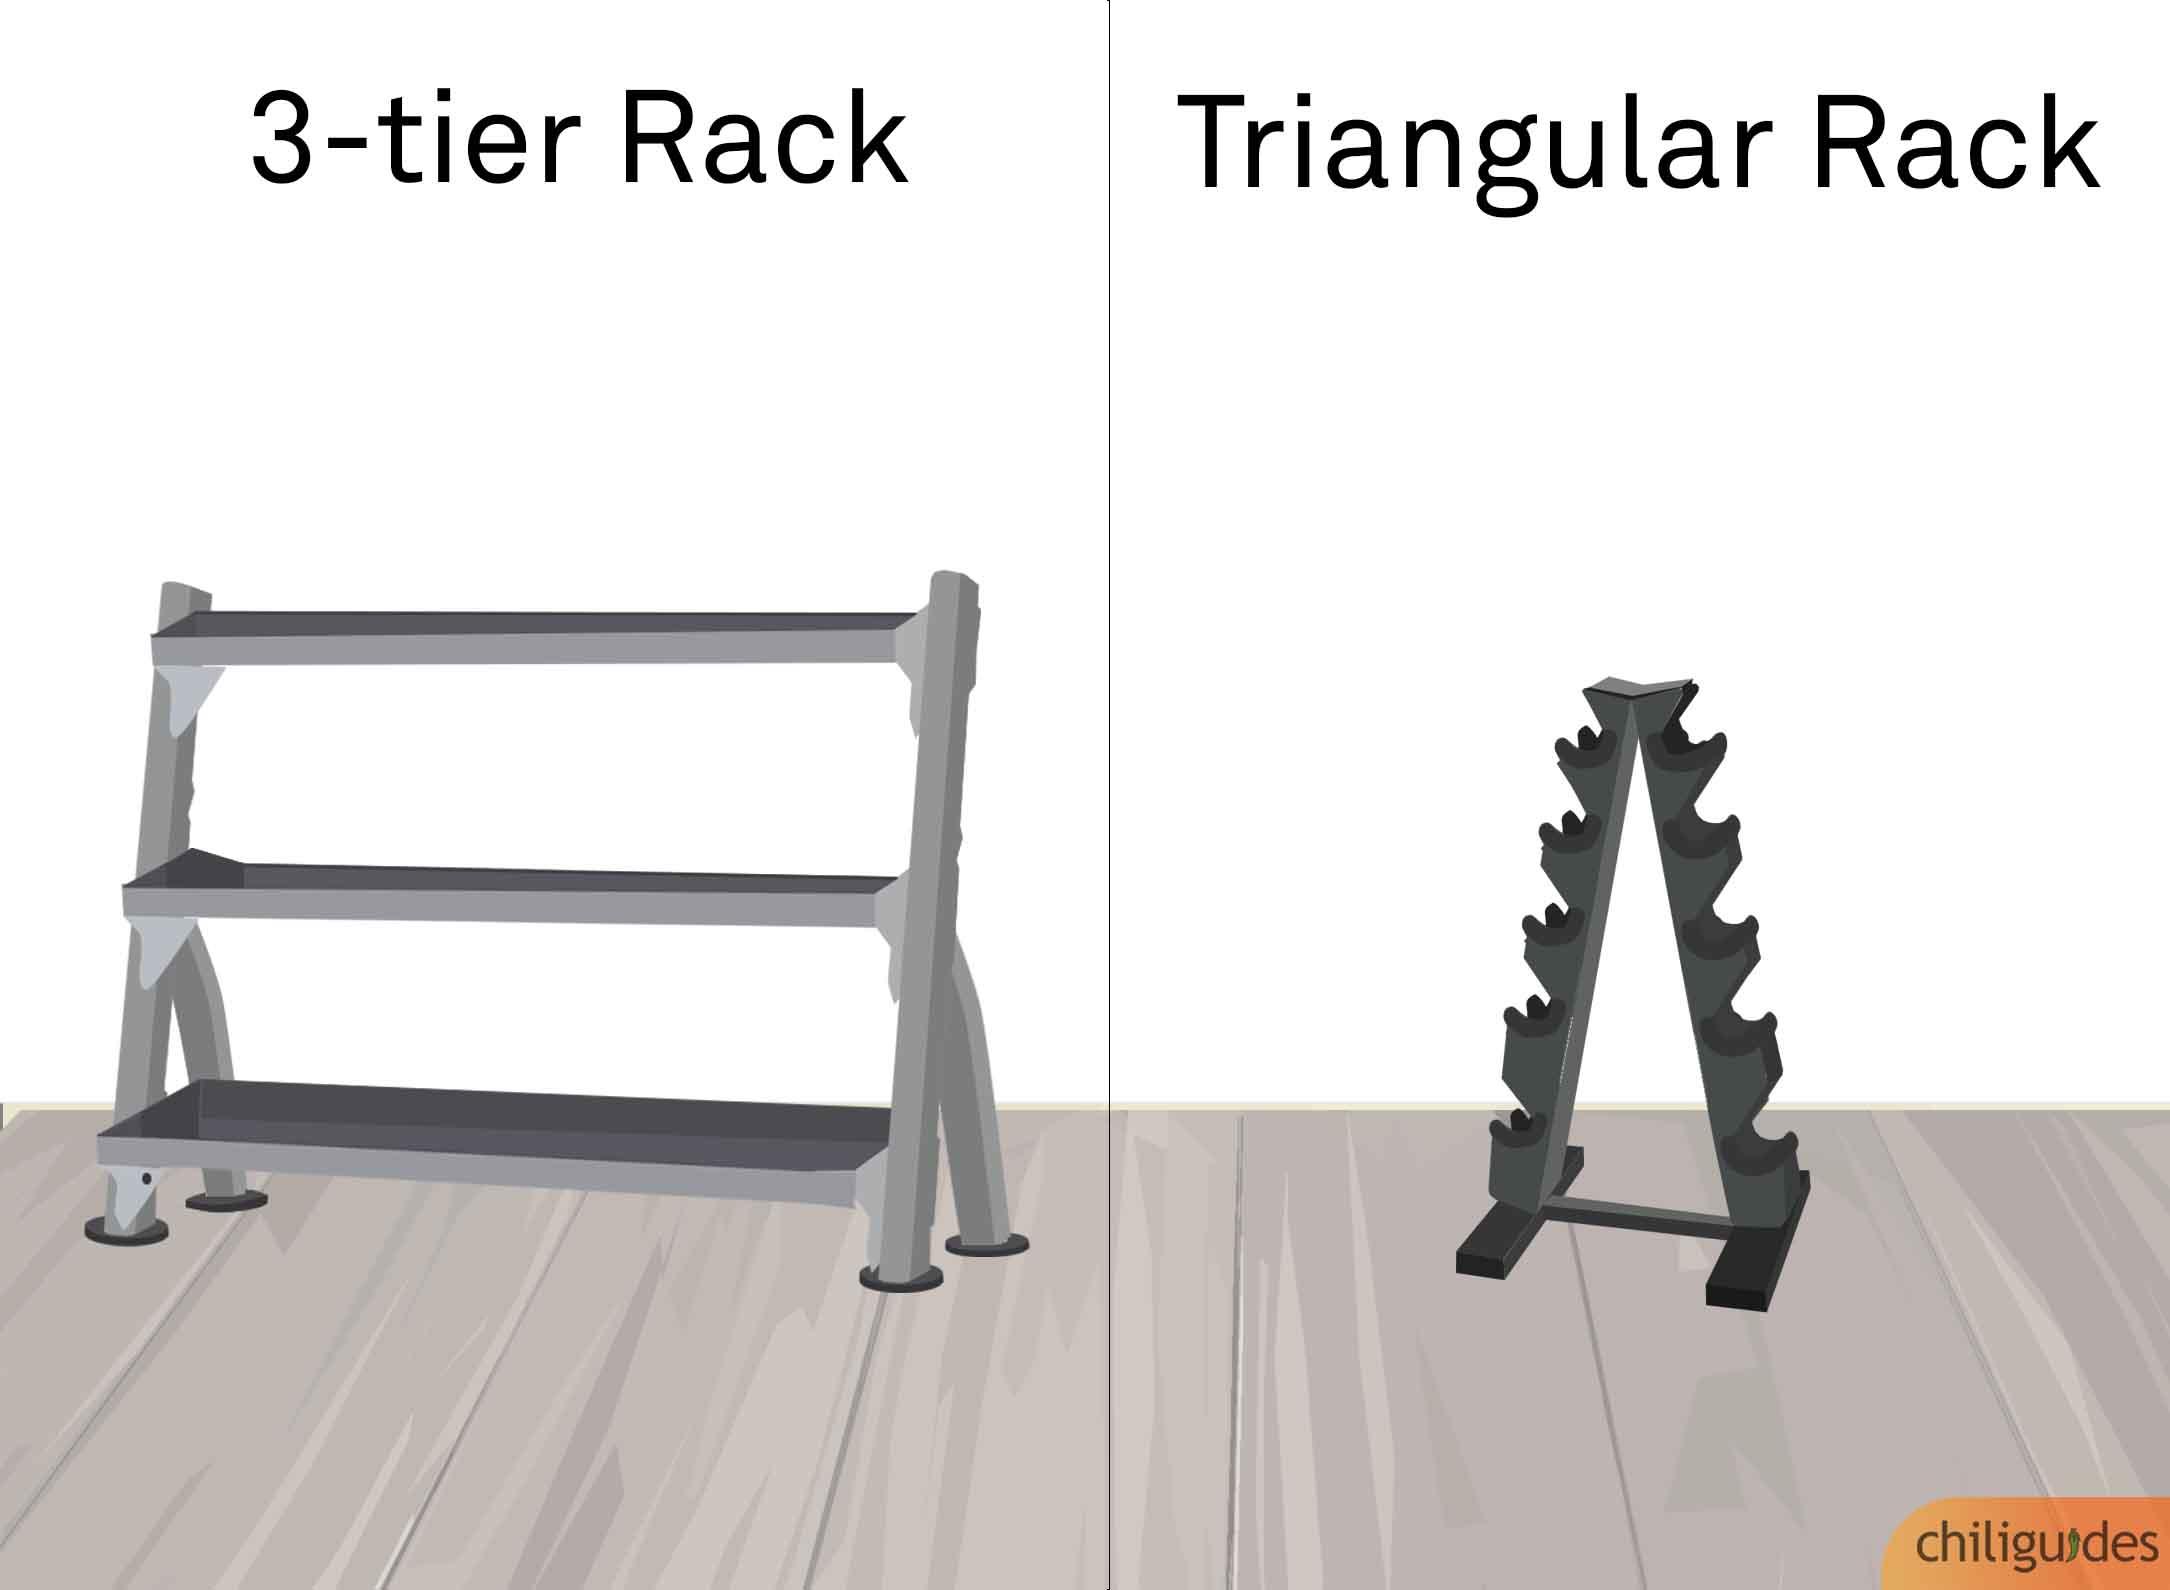 3 Tier Rack vs. Triangular Rack